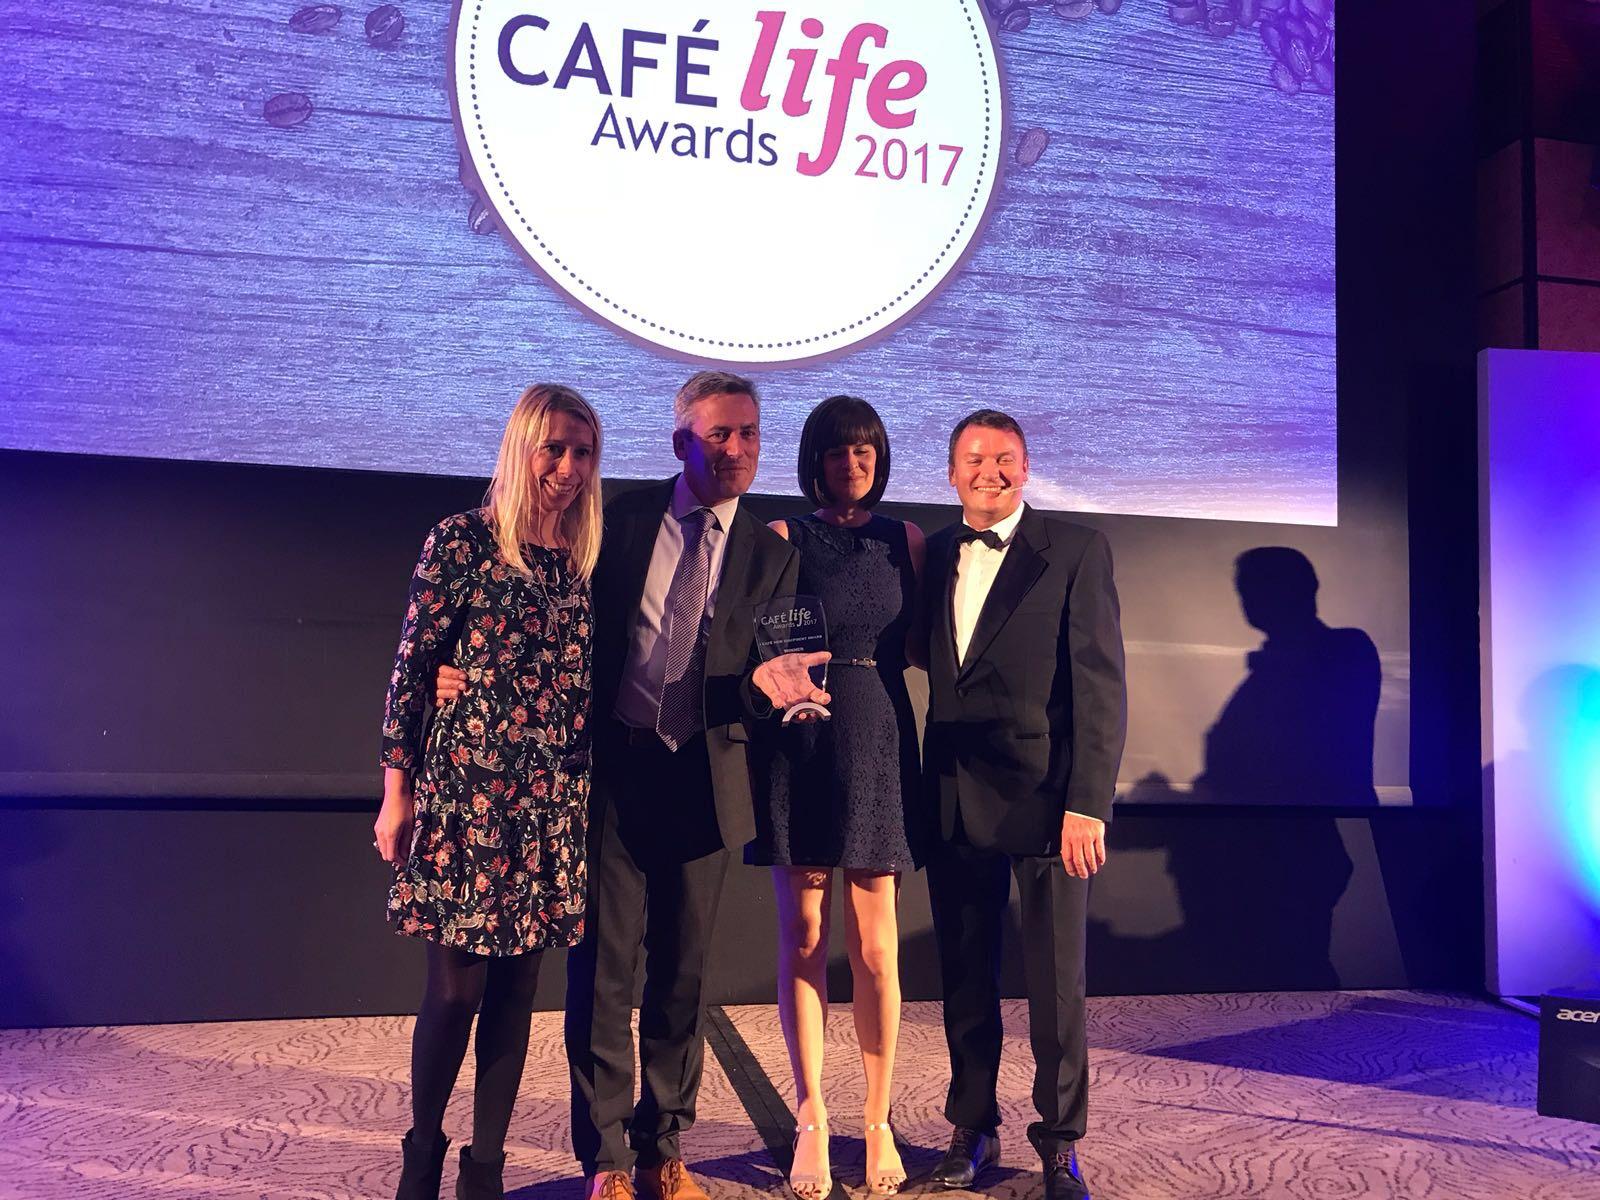 The Blendtec Nitro Blender Wins Best New Equipment at Café Life Awards